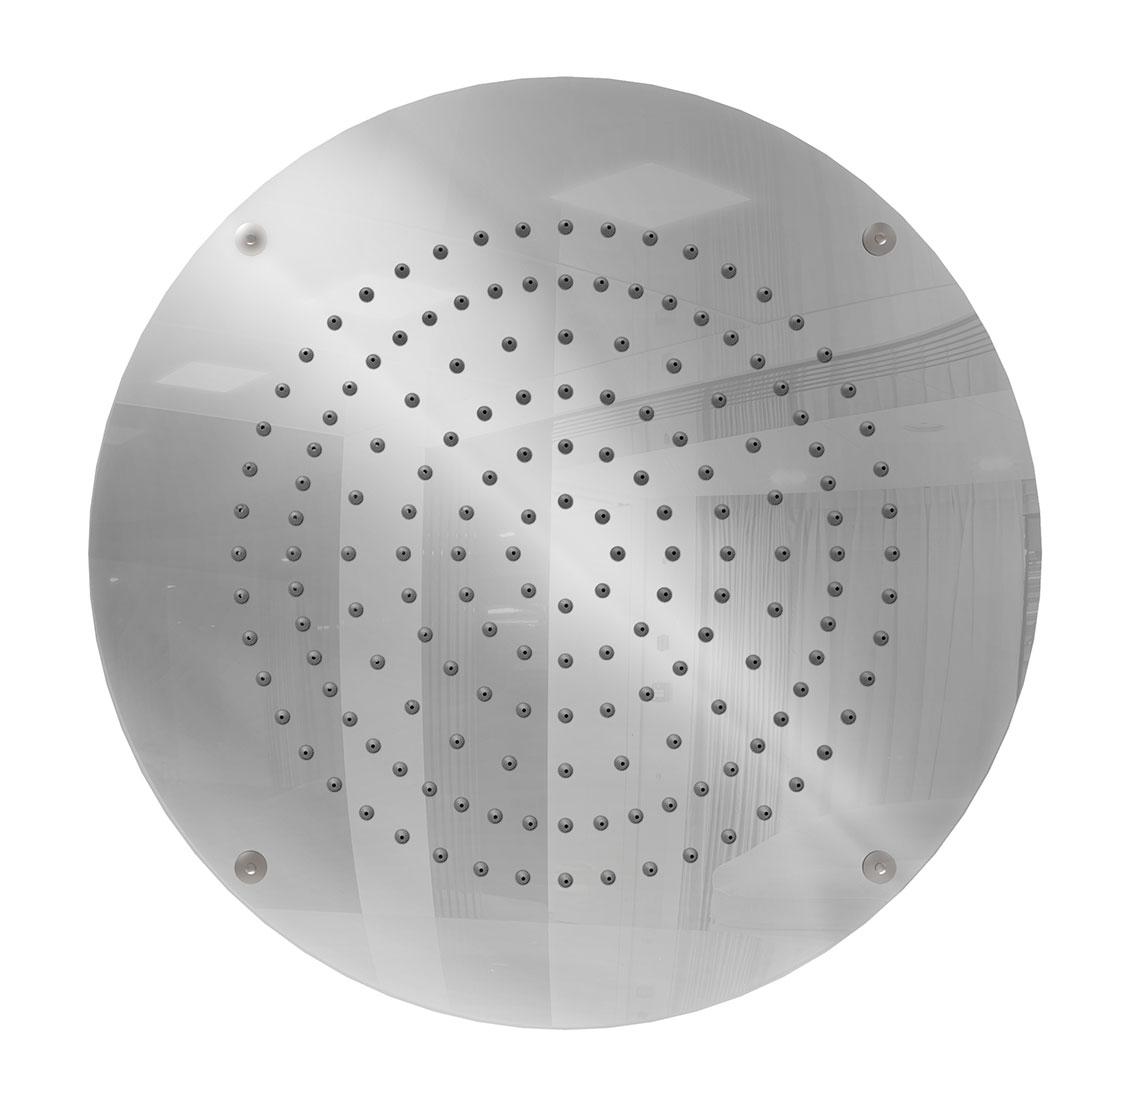 soffione-doccia-acciaio-inox-rotondo-ad-incasso-diam-350-1.jpg